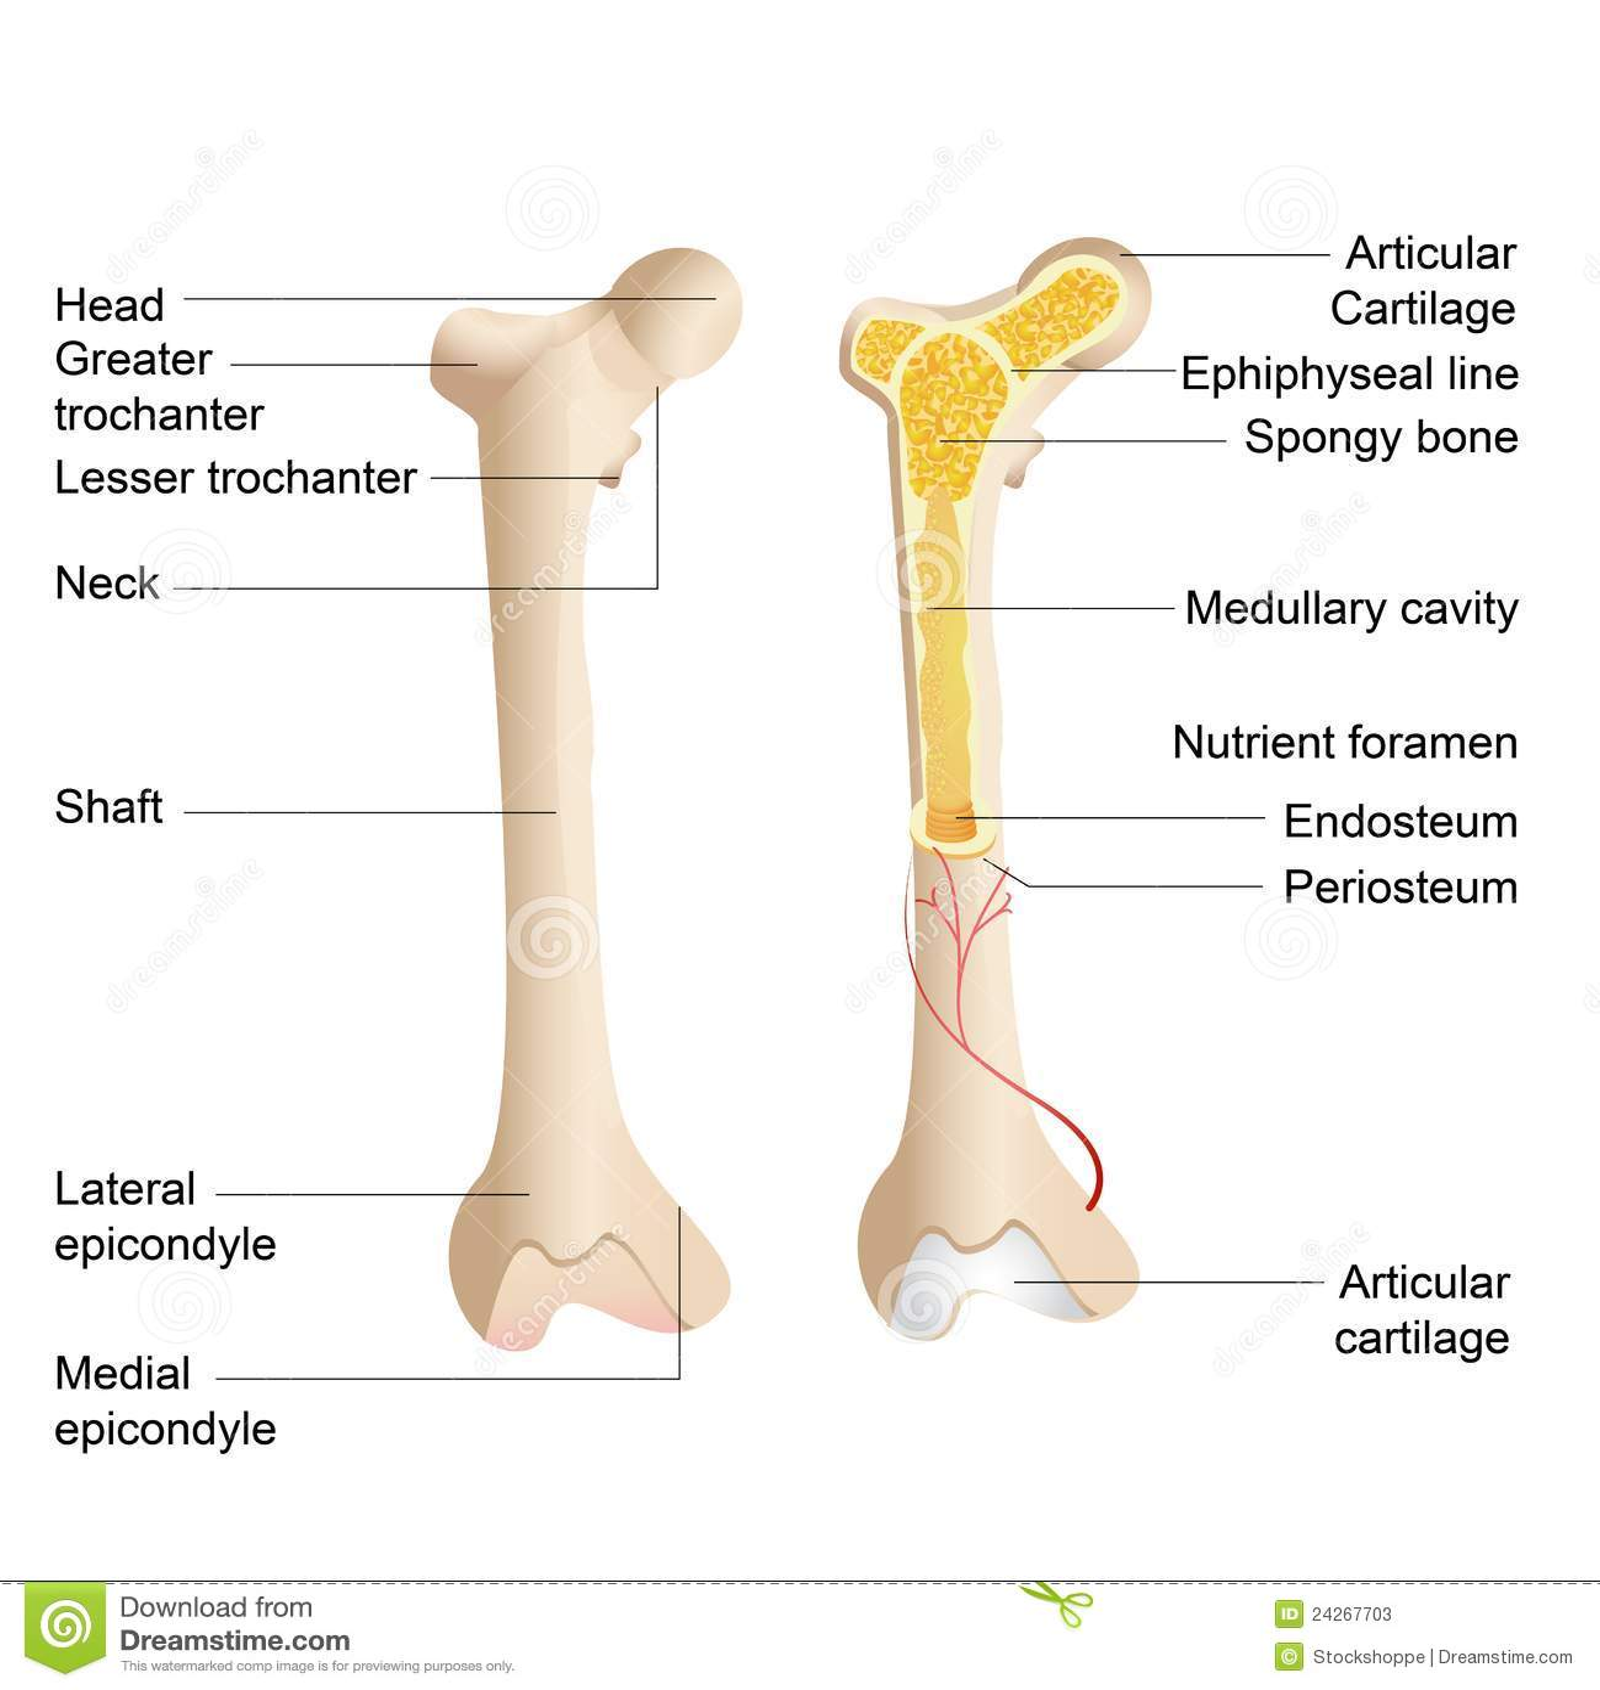 bone marrow cell diagram murray lawn mower solenoid wiring anatomy stock vector illustration of calcium